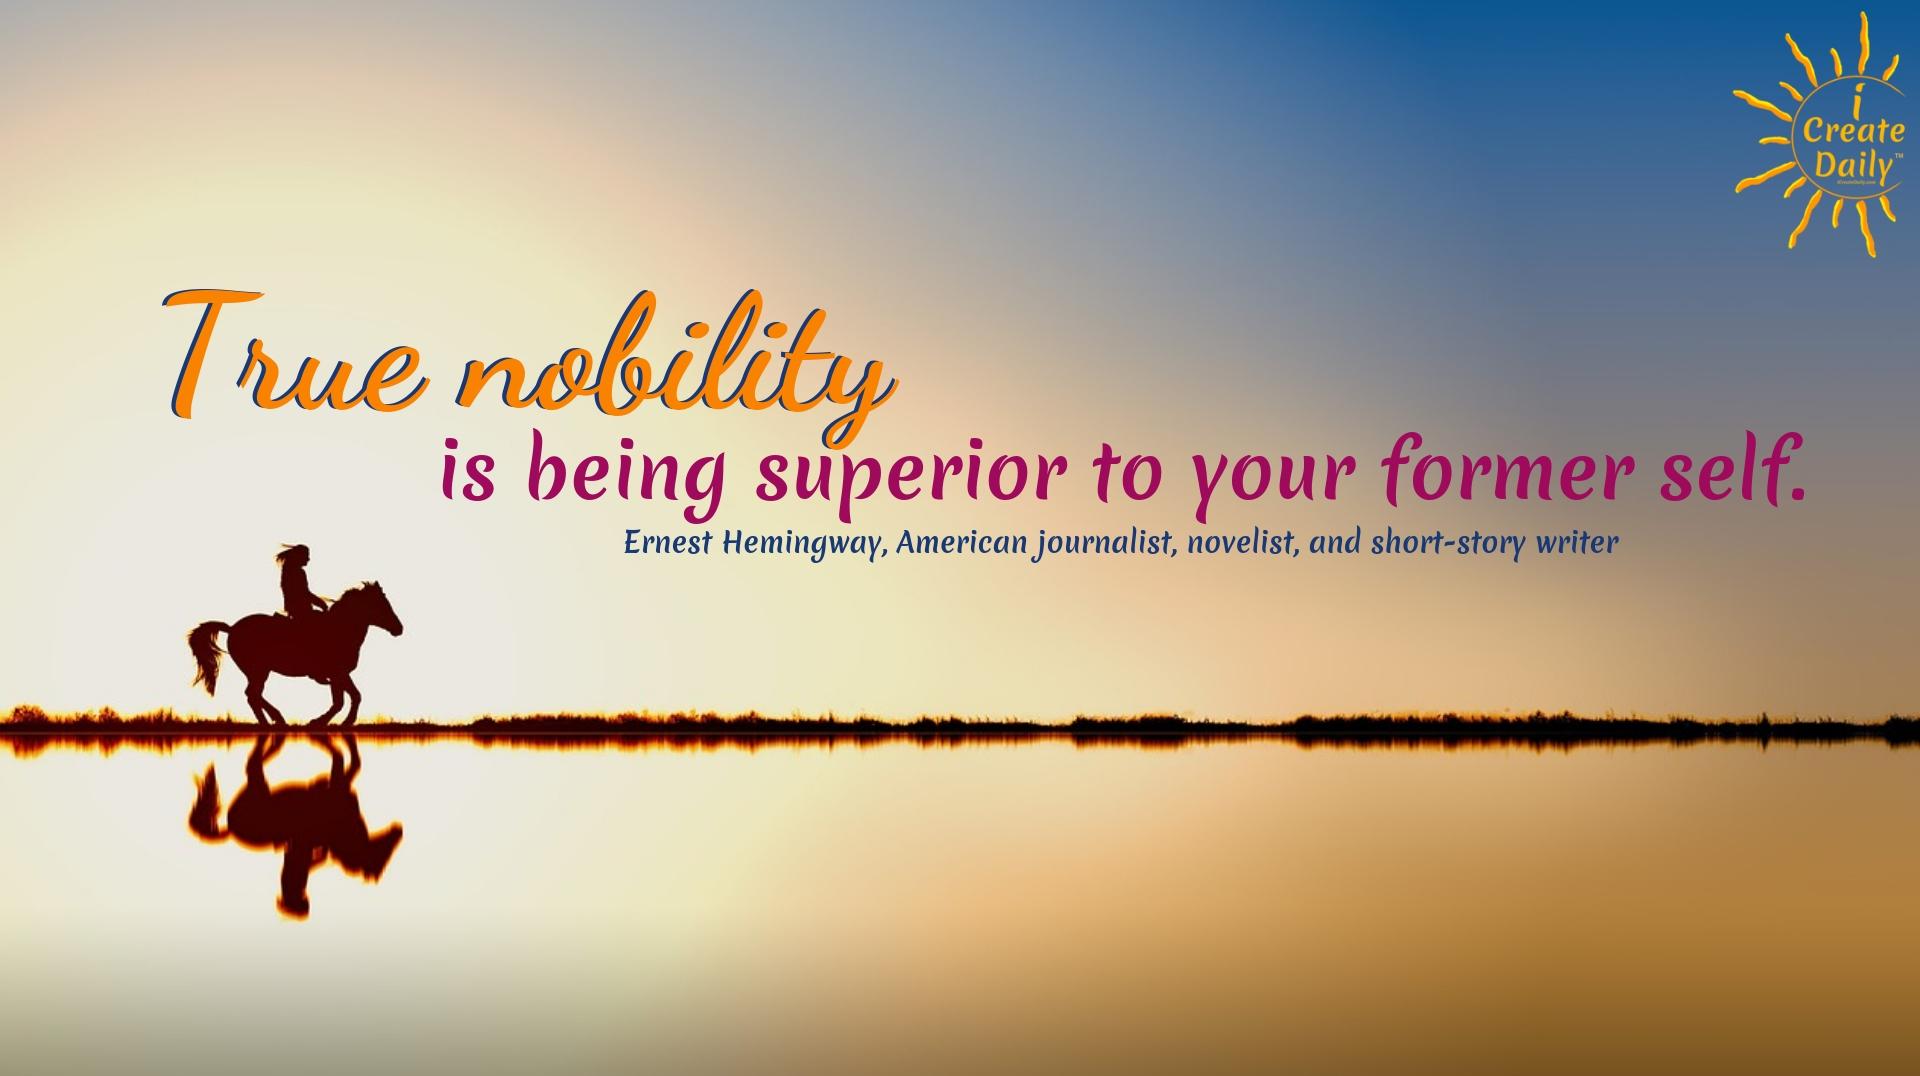 """True nobility is being superior to your former self."" ~Ernest Hemingway, writer, author, 1899-1961 #Growth #Positive #Entrepreneur #SelfDevelopment #Success #Inspiration #Affirmations #Abundance #Challenge #Shift #Goals"